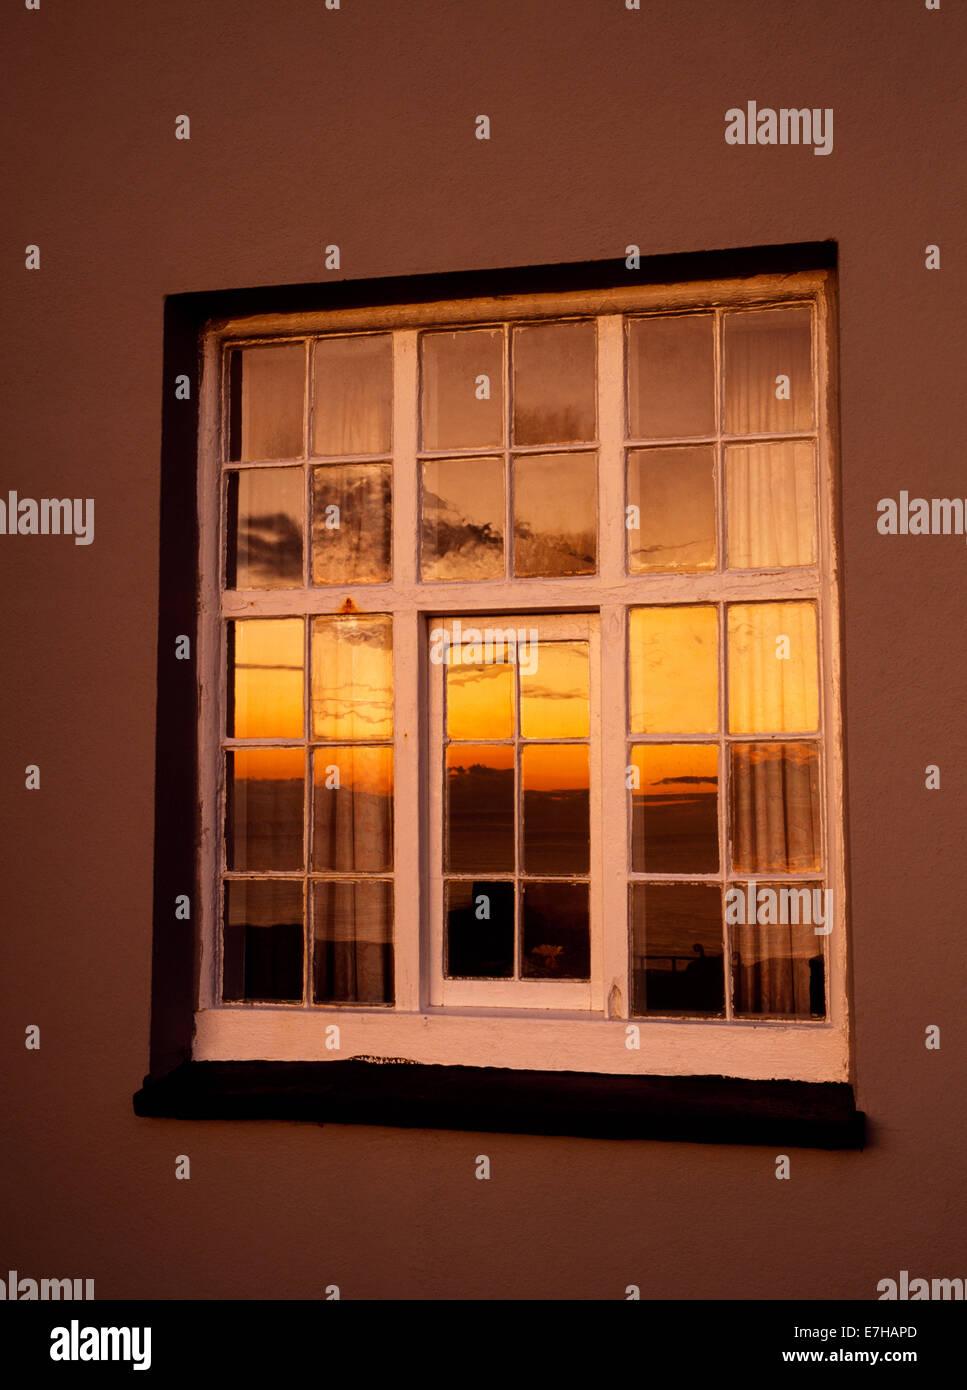 Panes Detail Stockfotos & Panes Detail Bilder - Seite 6 - Alamy